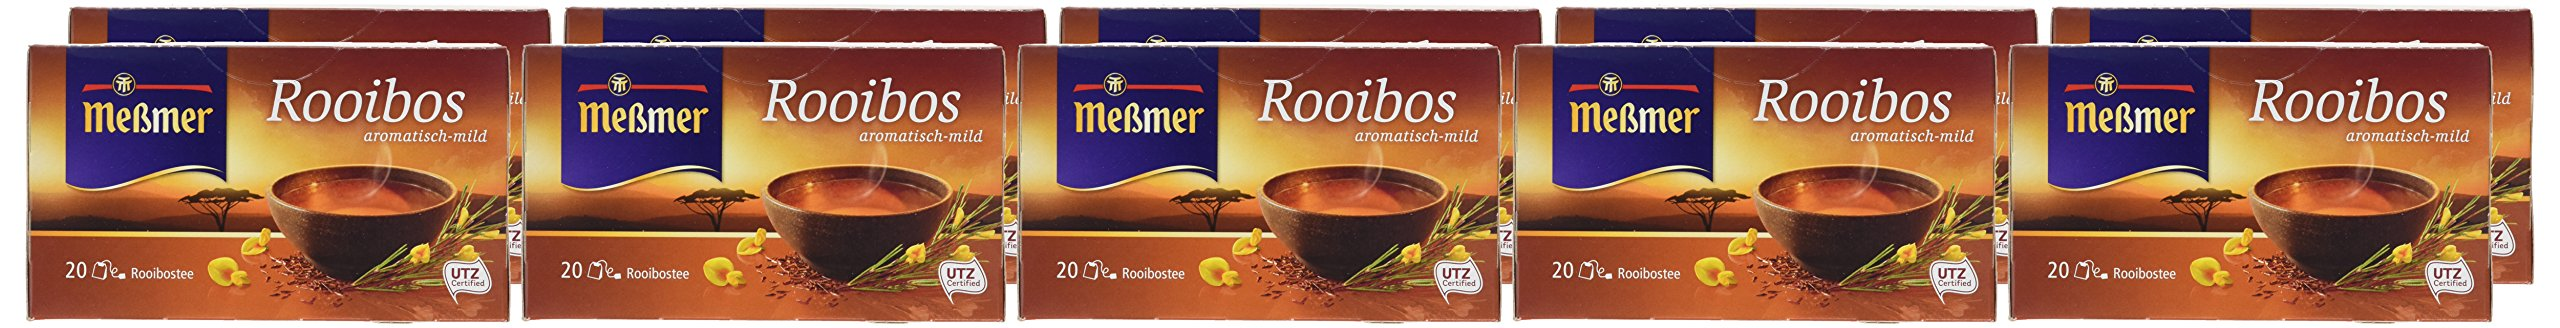 Memer-Rooibos-pur-nicht-aromatisiert-20-TB